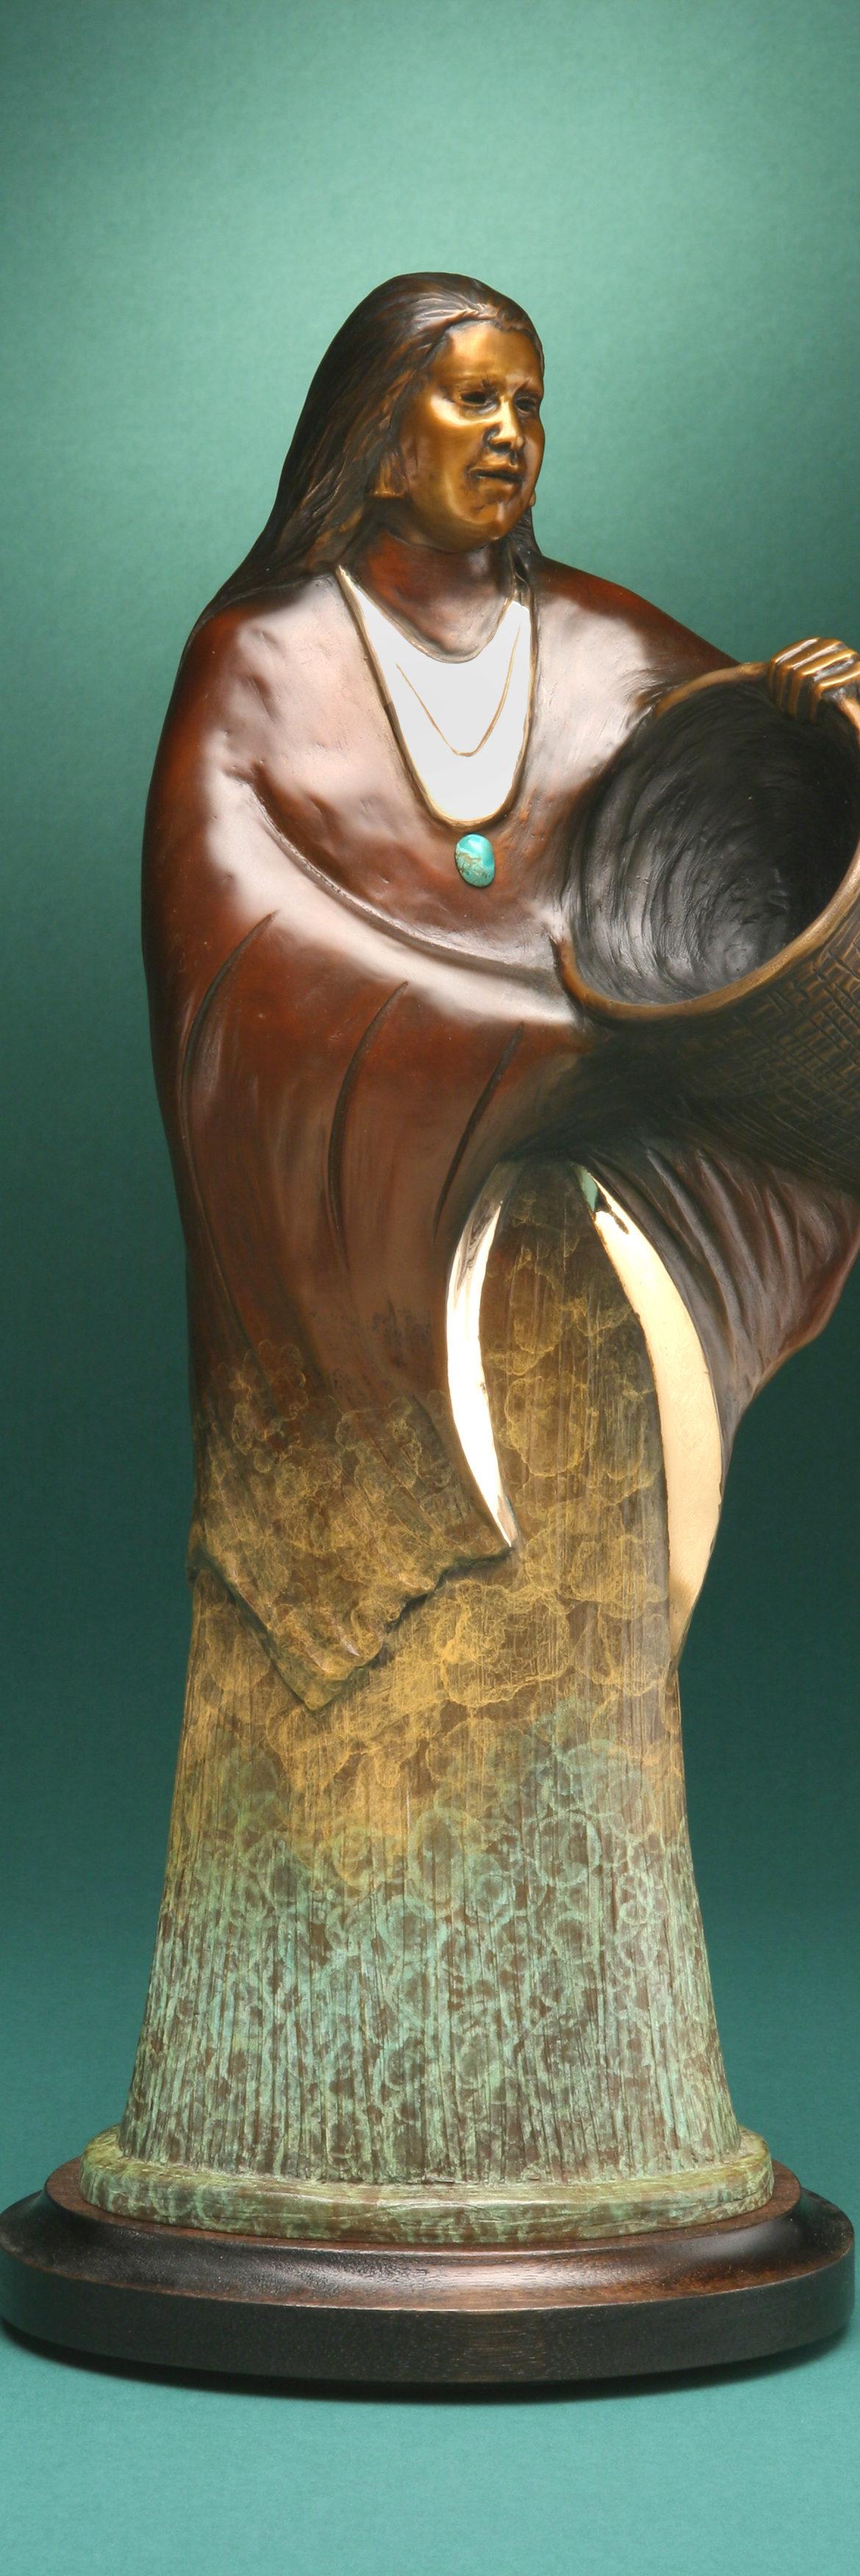 Veronica, Felicia Sculpture, Rogoway Turquoise Tortoise Gallery